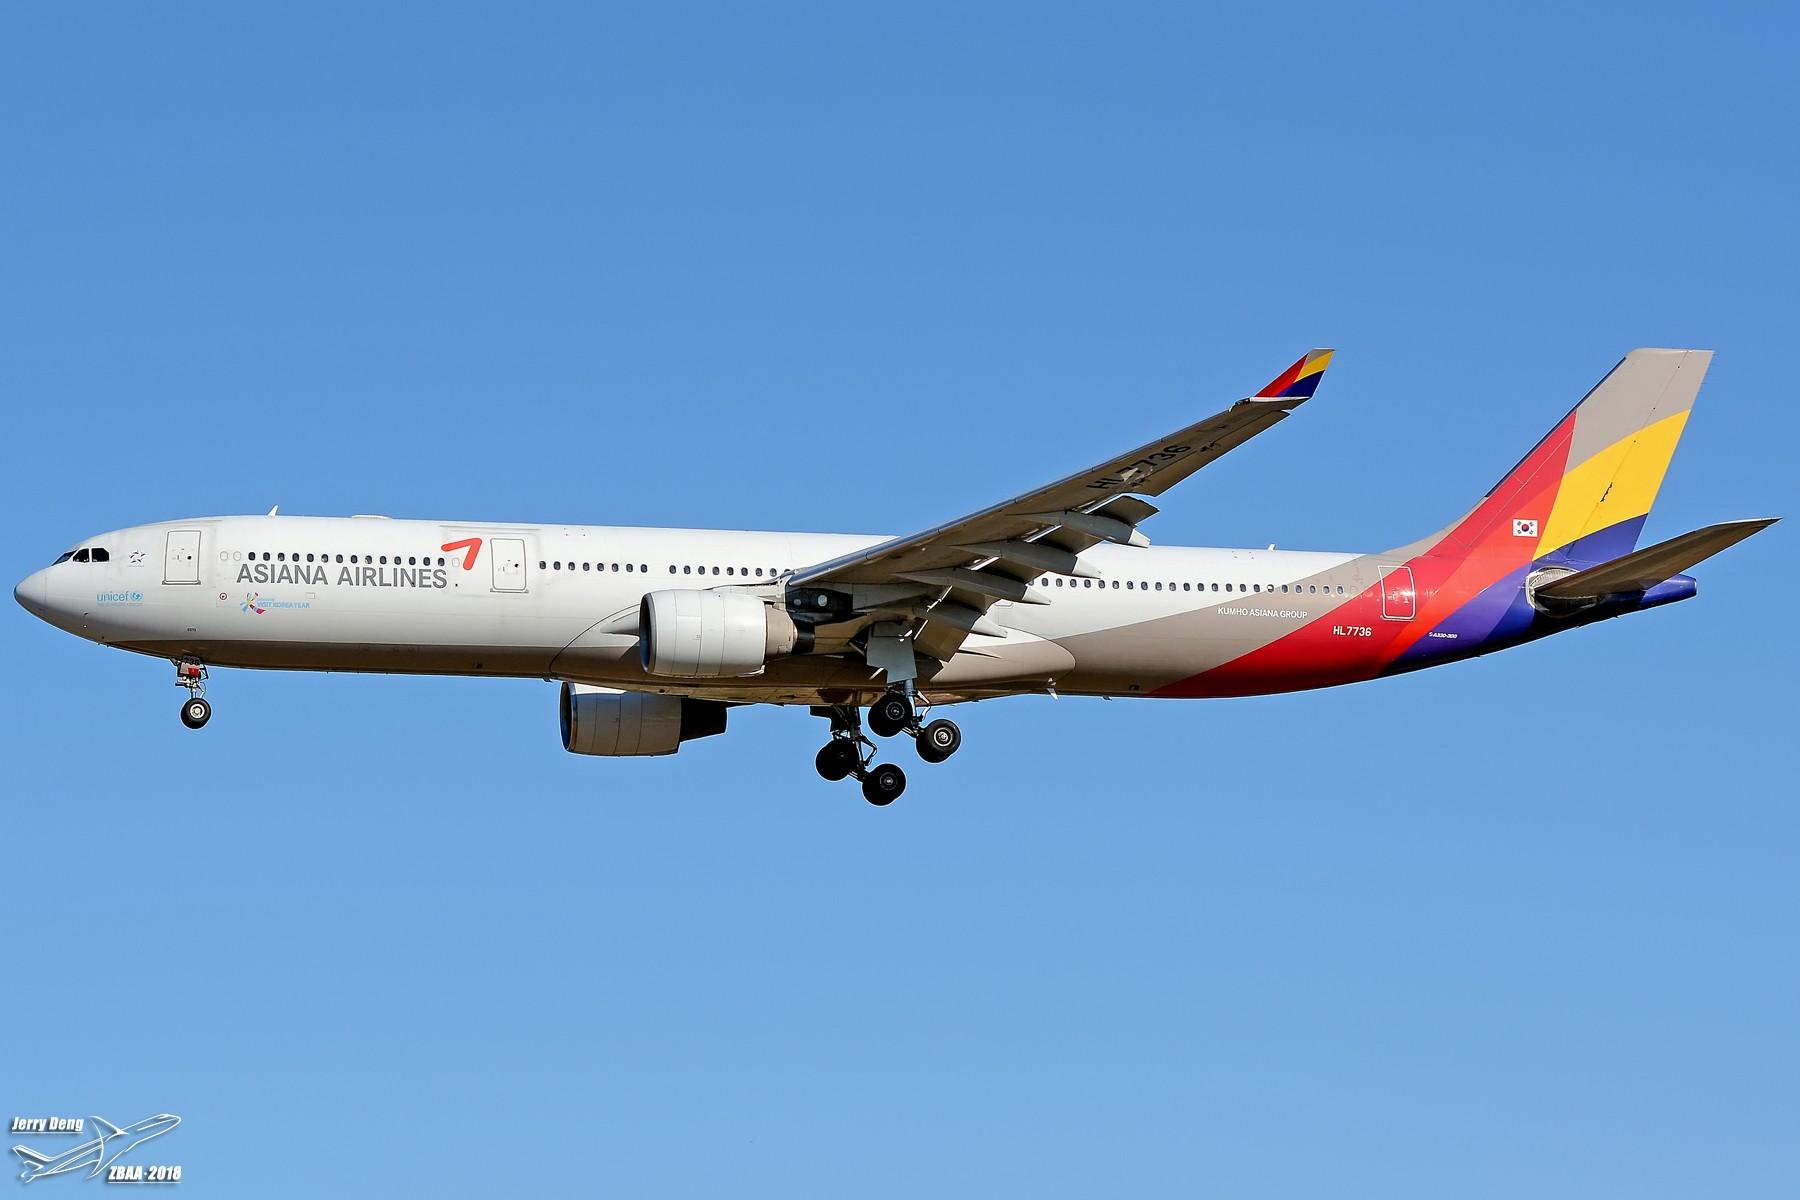 Re:[原创]【多图党】出差赶上天气不错ZBAA随拍 AIRBUS A330-300 HL7736 中国北京首都国际机场